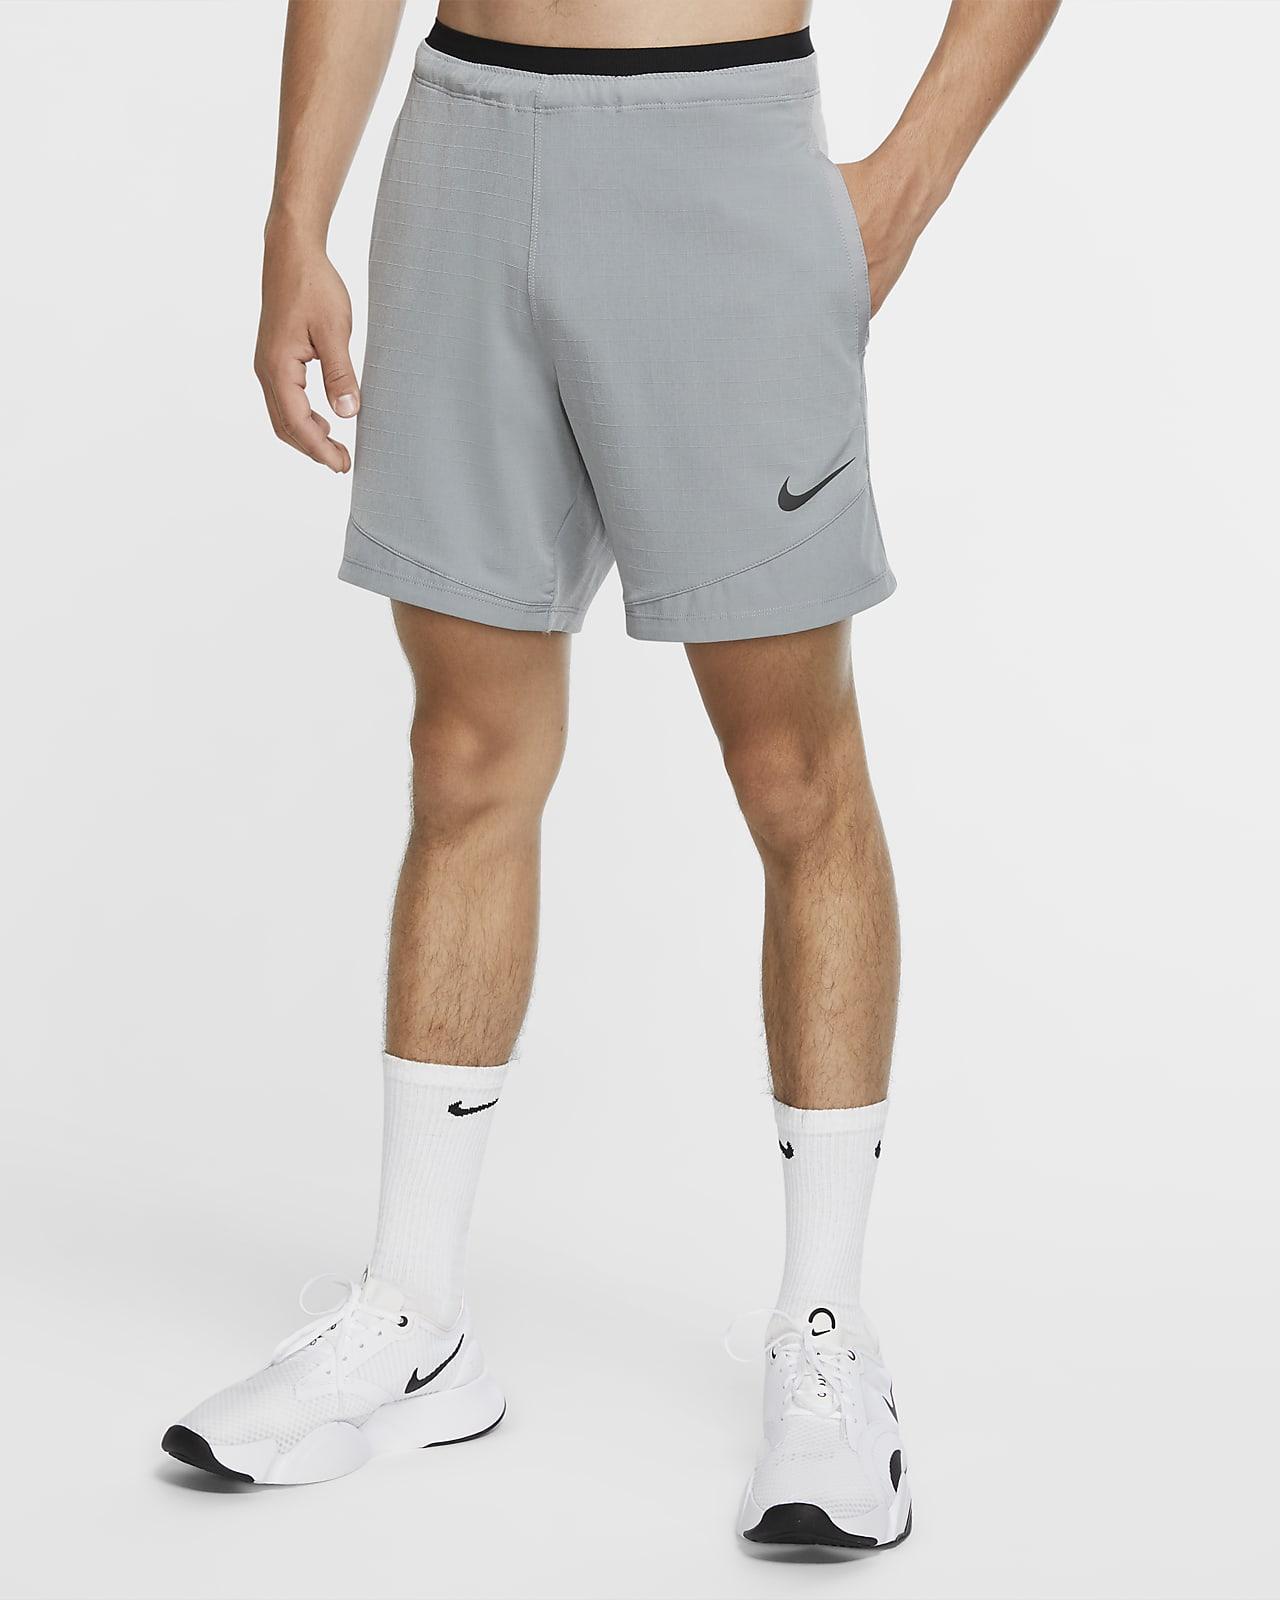 Shorts para hombre Nike Pro Rep